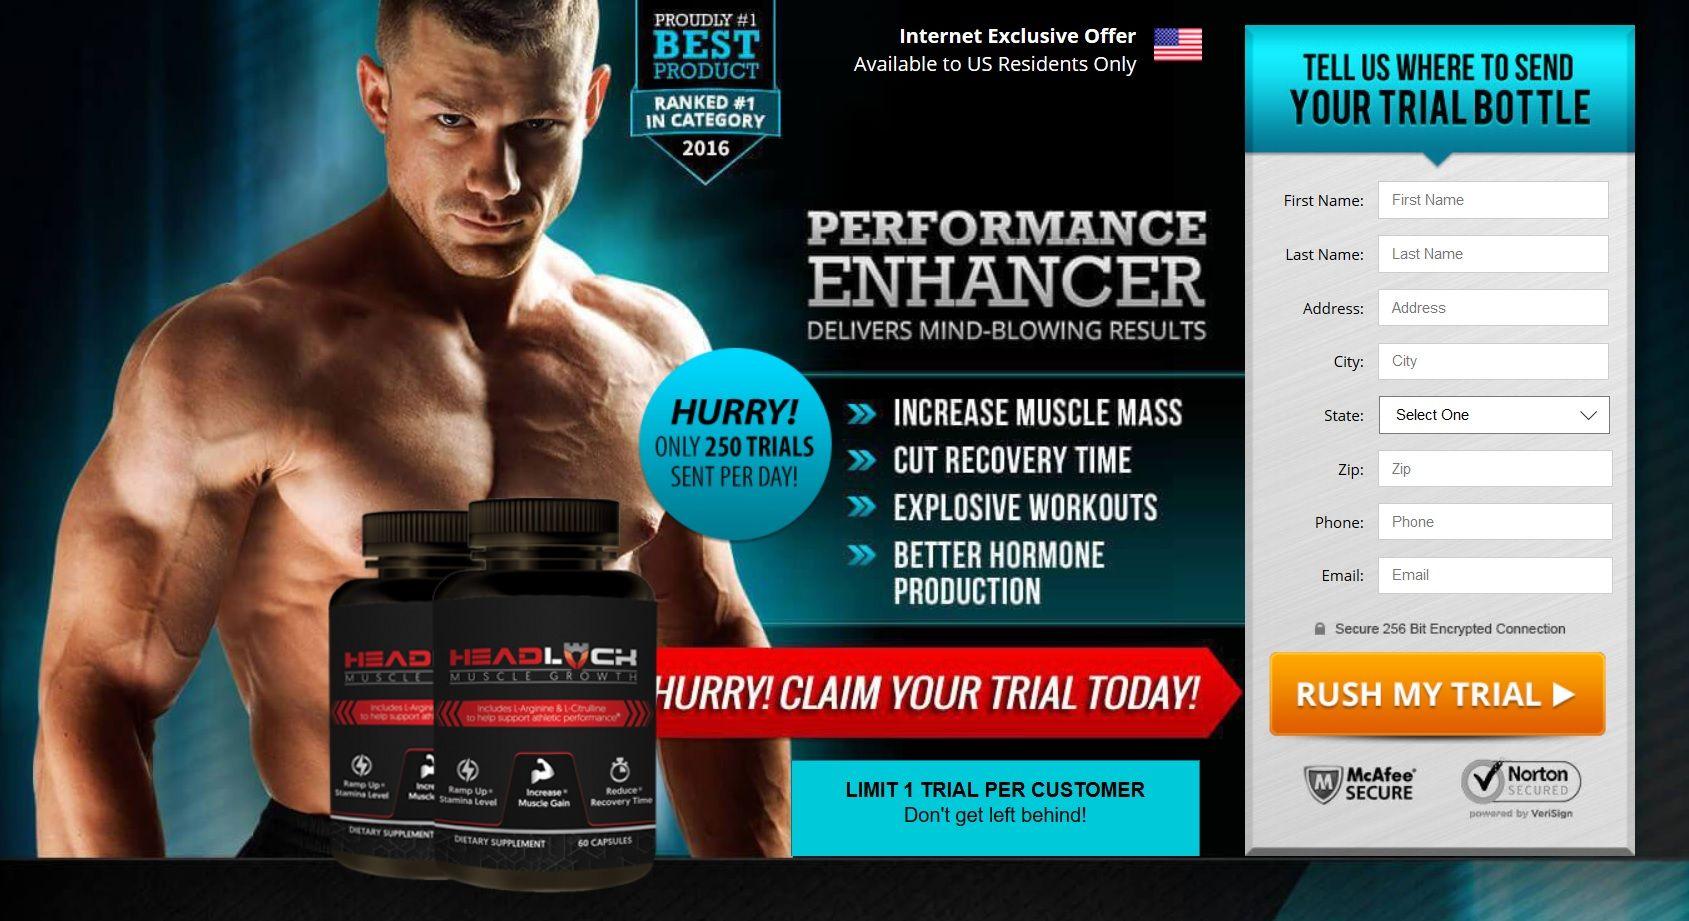 headlock muscle growth where to buy headlock muscle growth